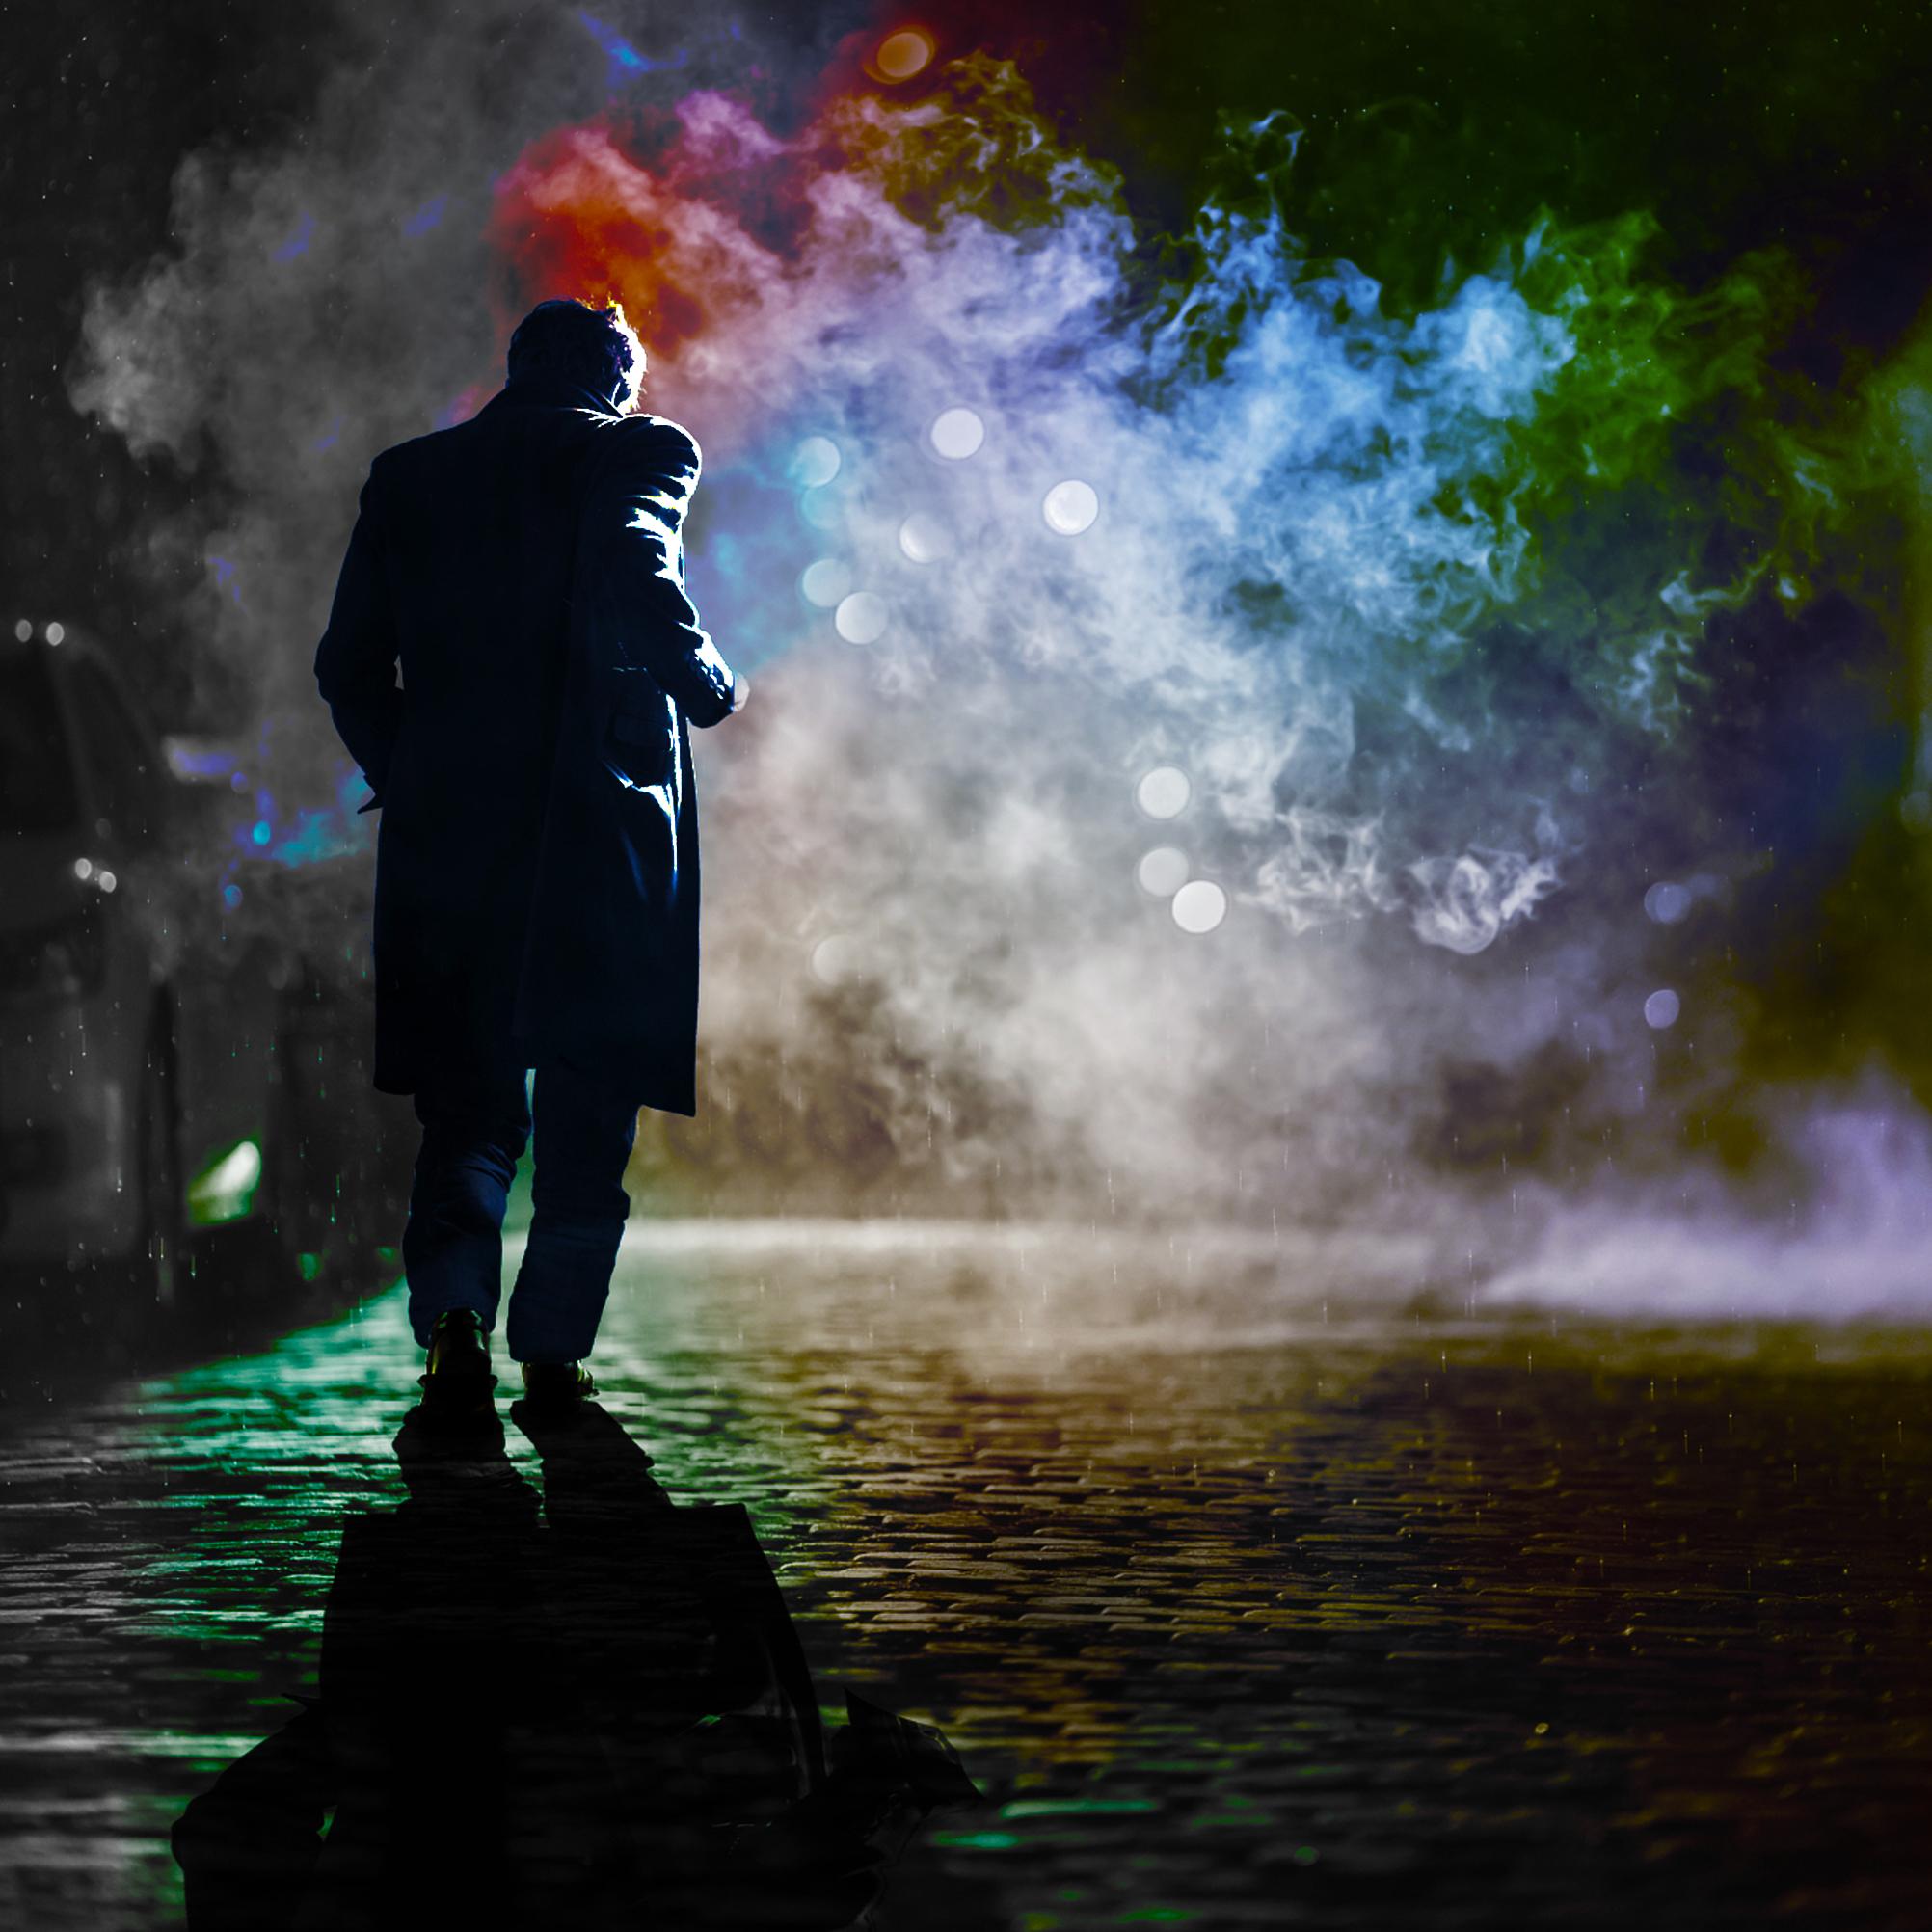 long shadows: Kings Theatre